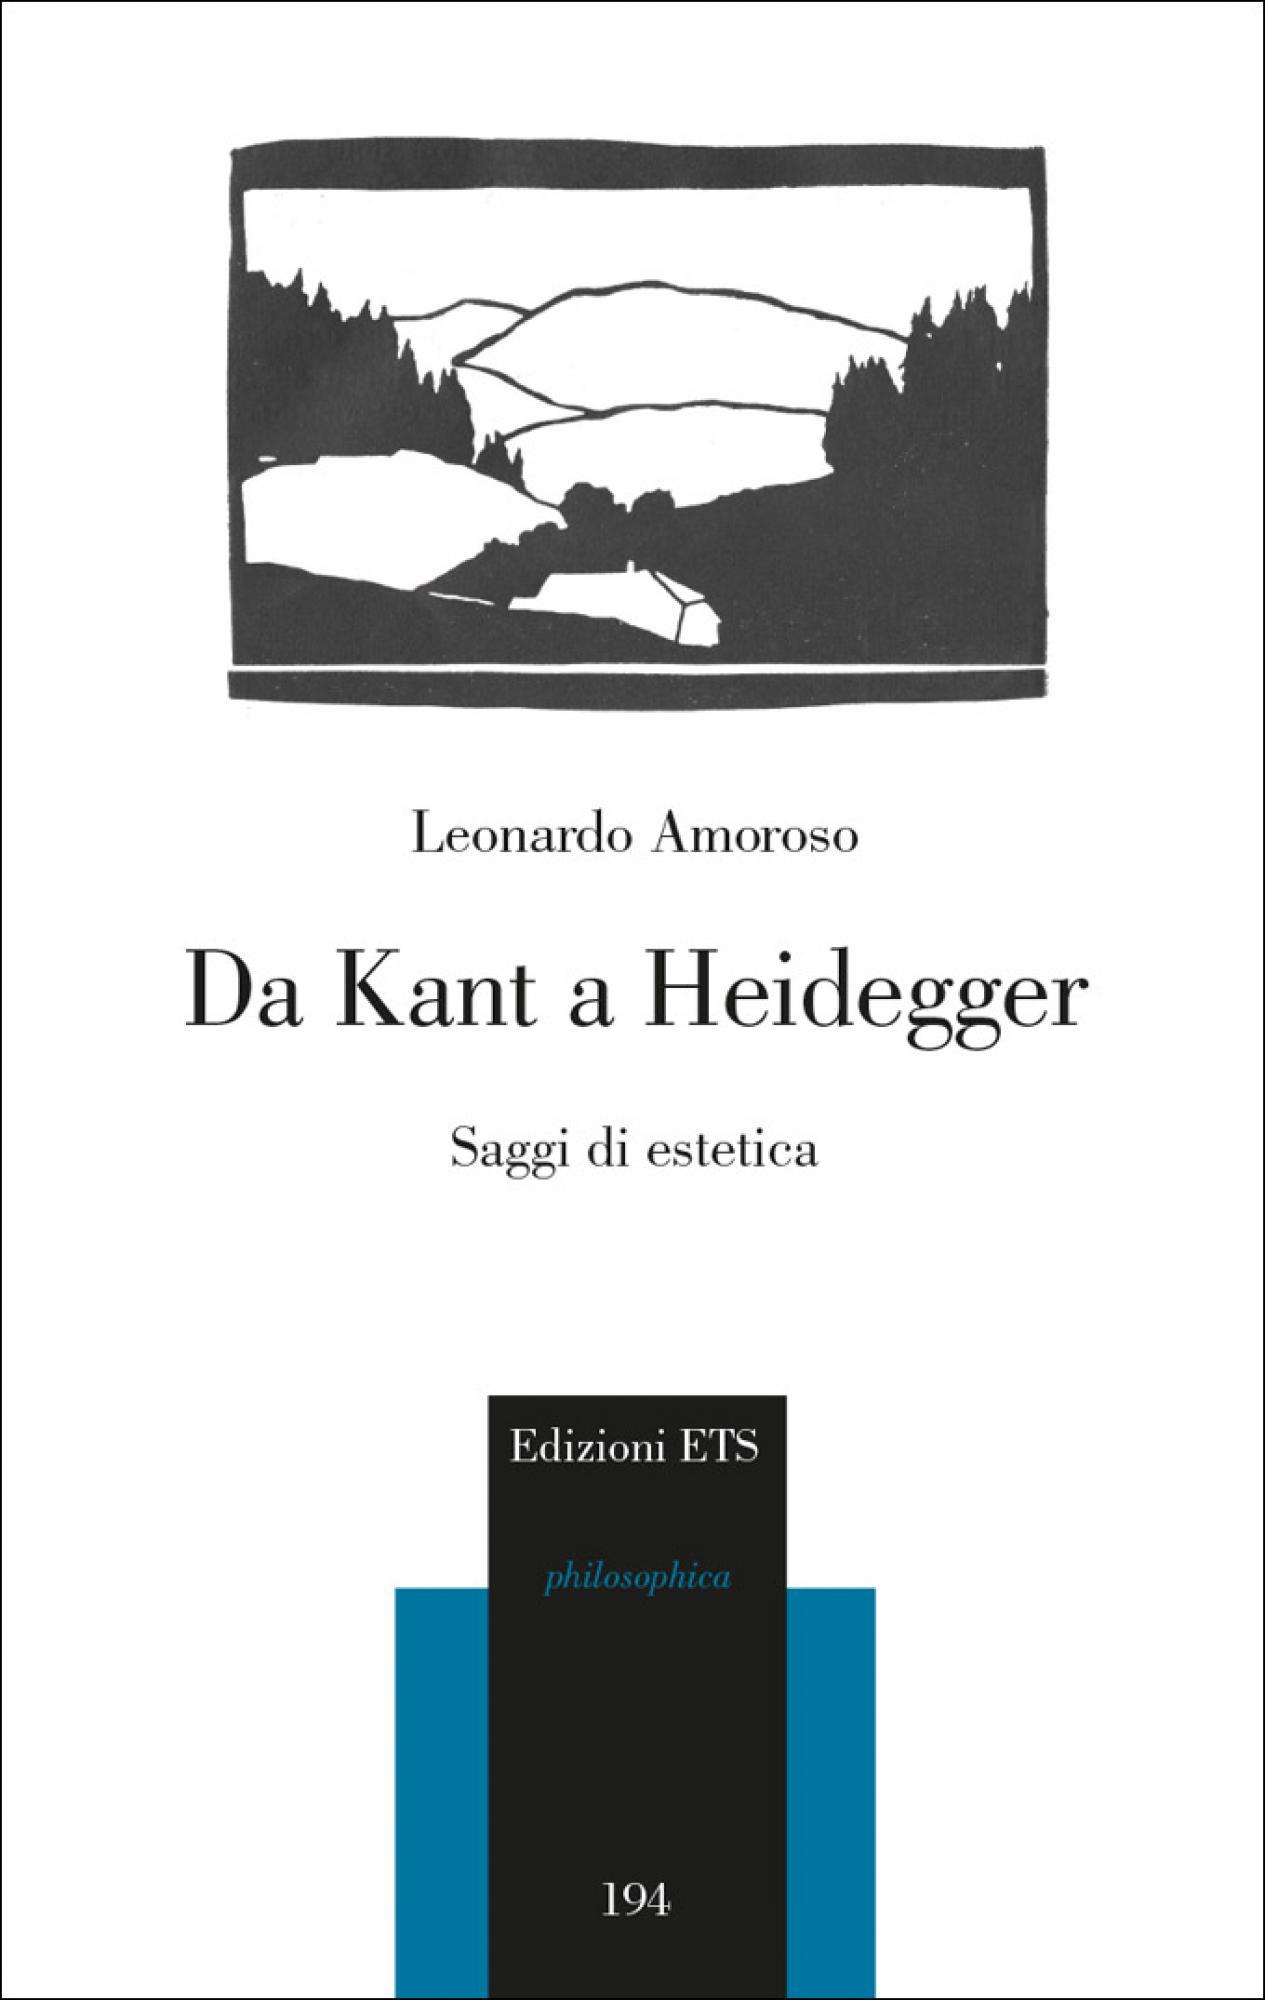 Da Kant a Heidegger.Saggi di estetica